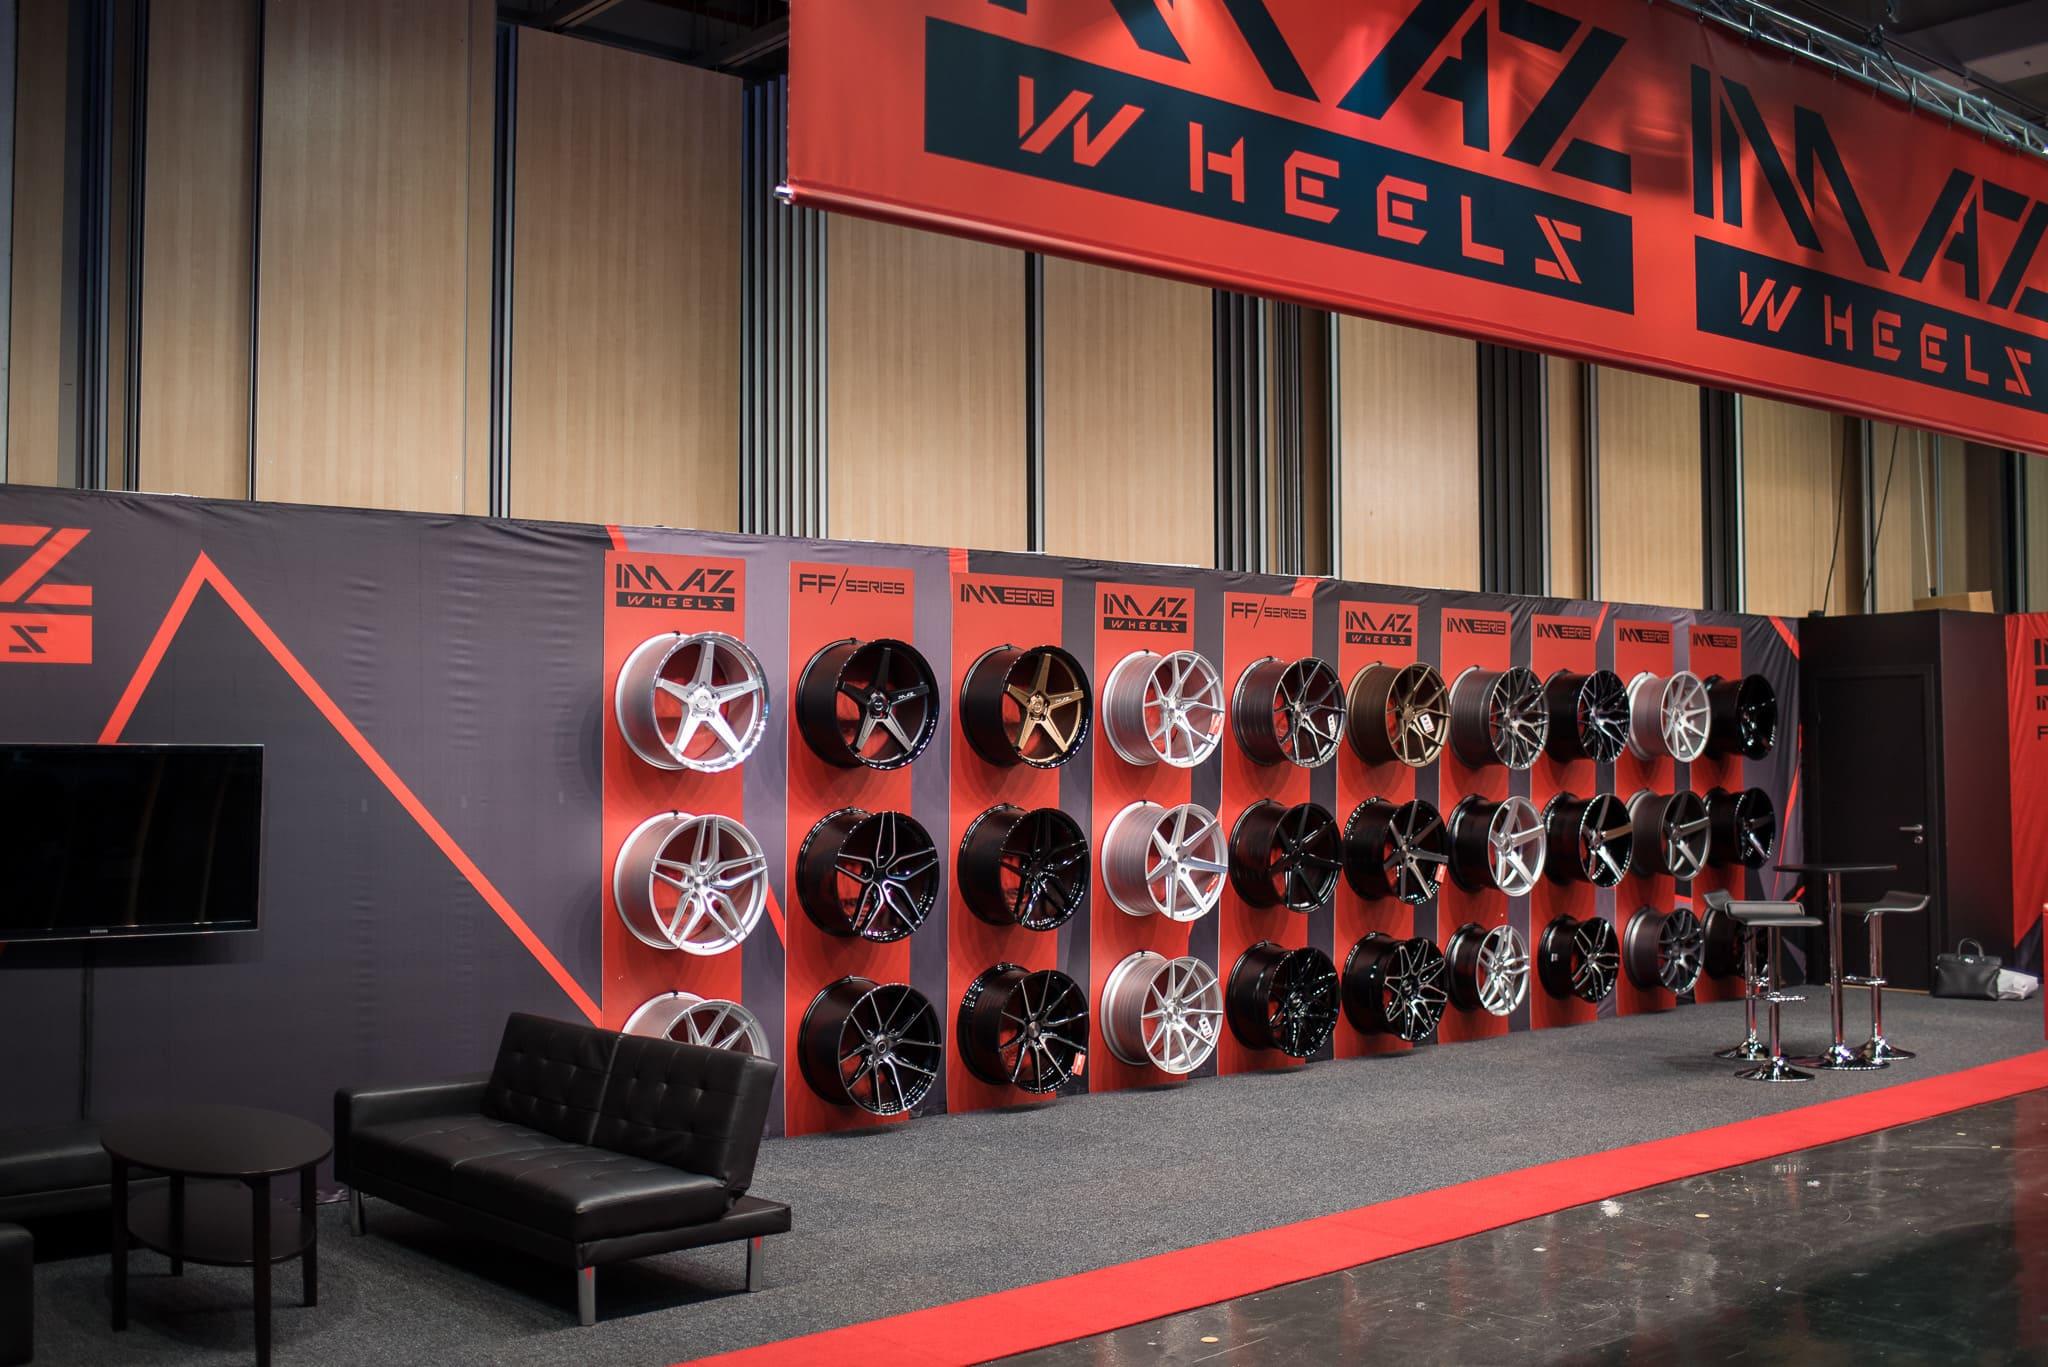 Däckline Imaz Wheels Monter Automässan 2020 Swedish Fair Göteborg Front Row Exhibitions